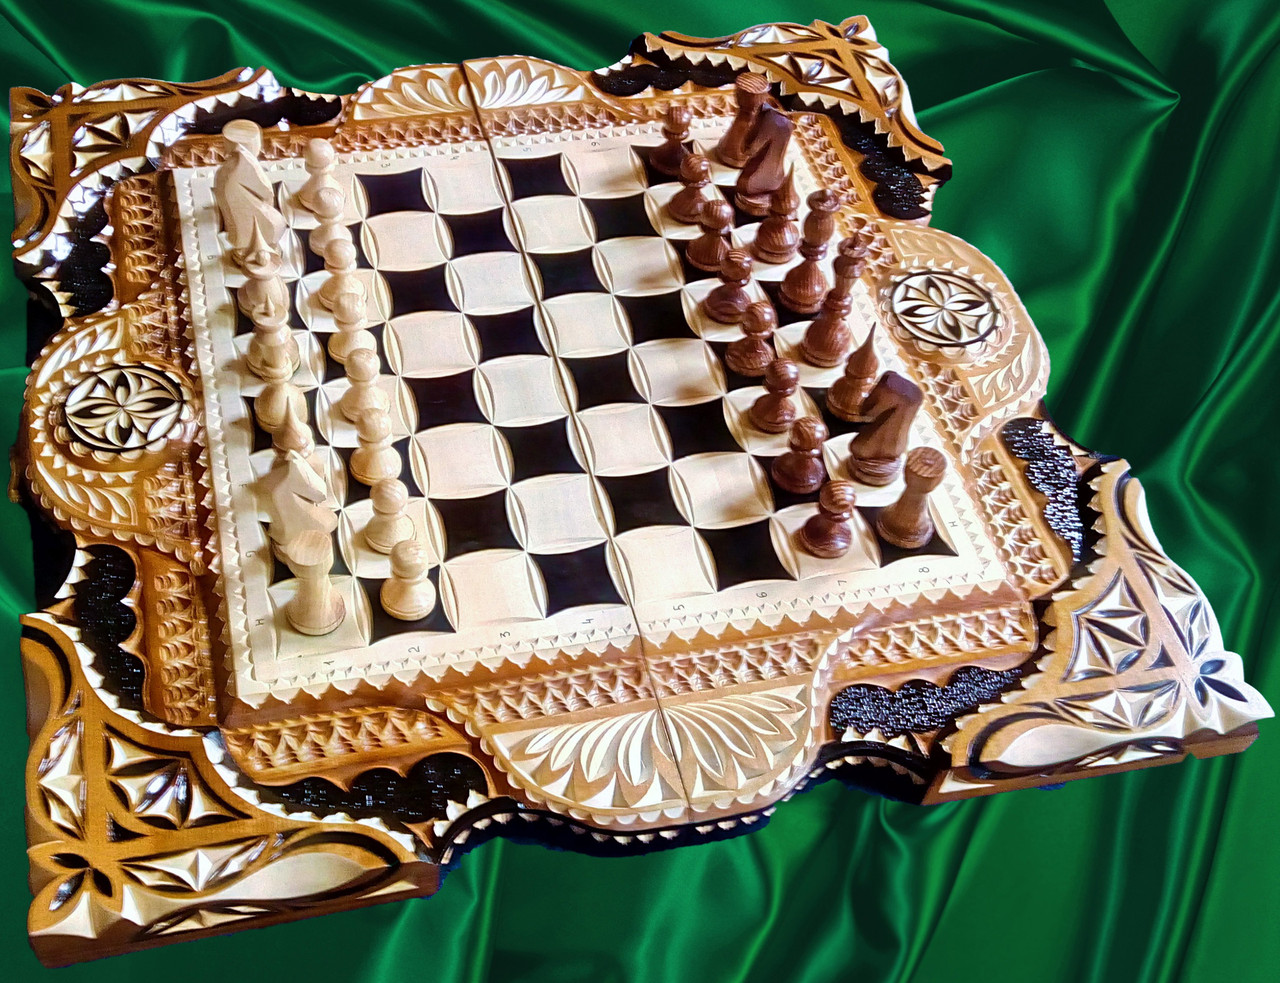 Шахматы-нарды эксклюзивные ** Подарочные **